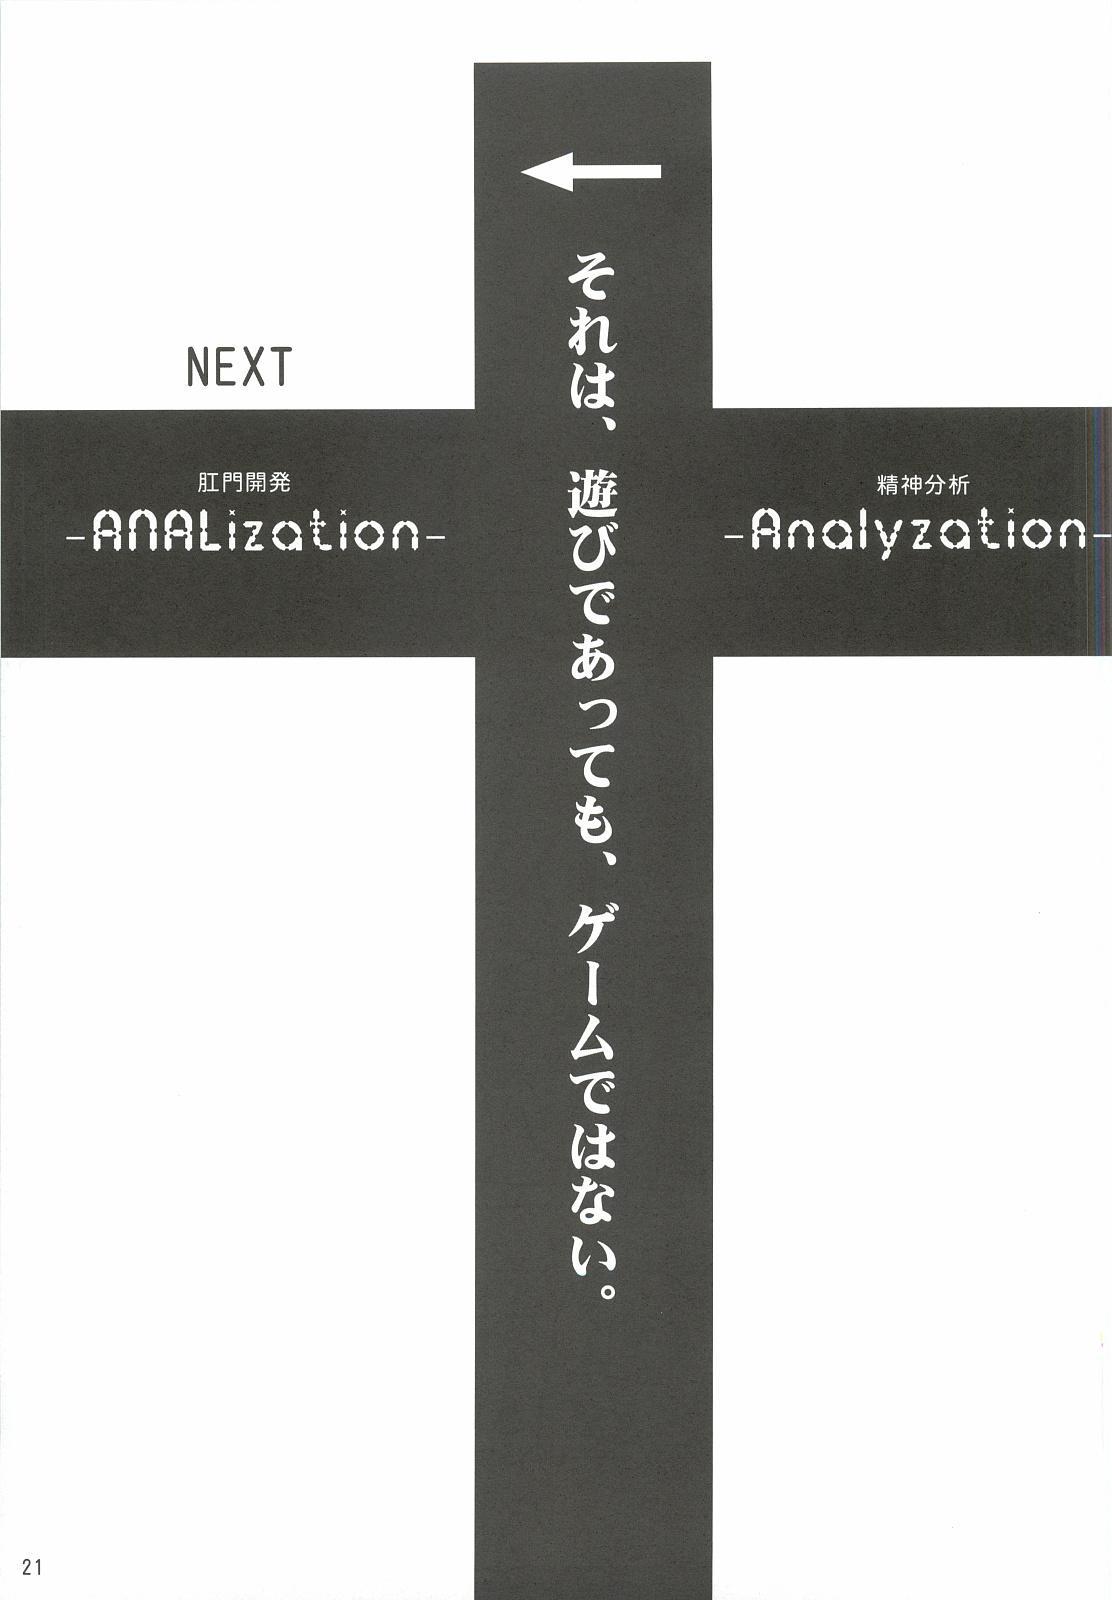 Silica Asuna Offline Analyzation 19